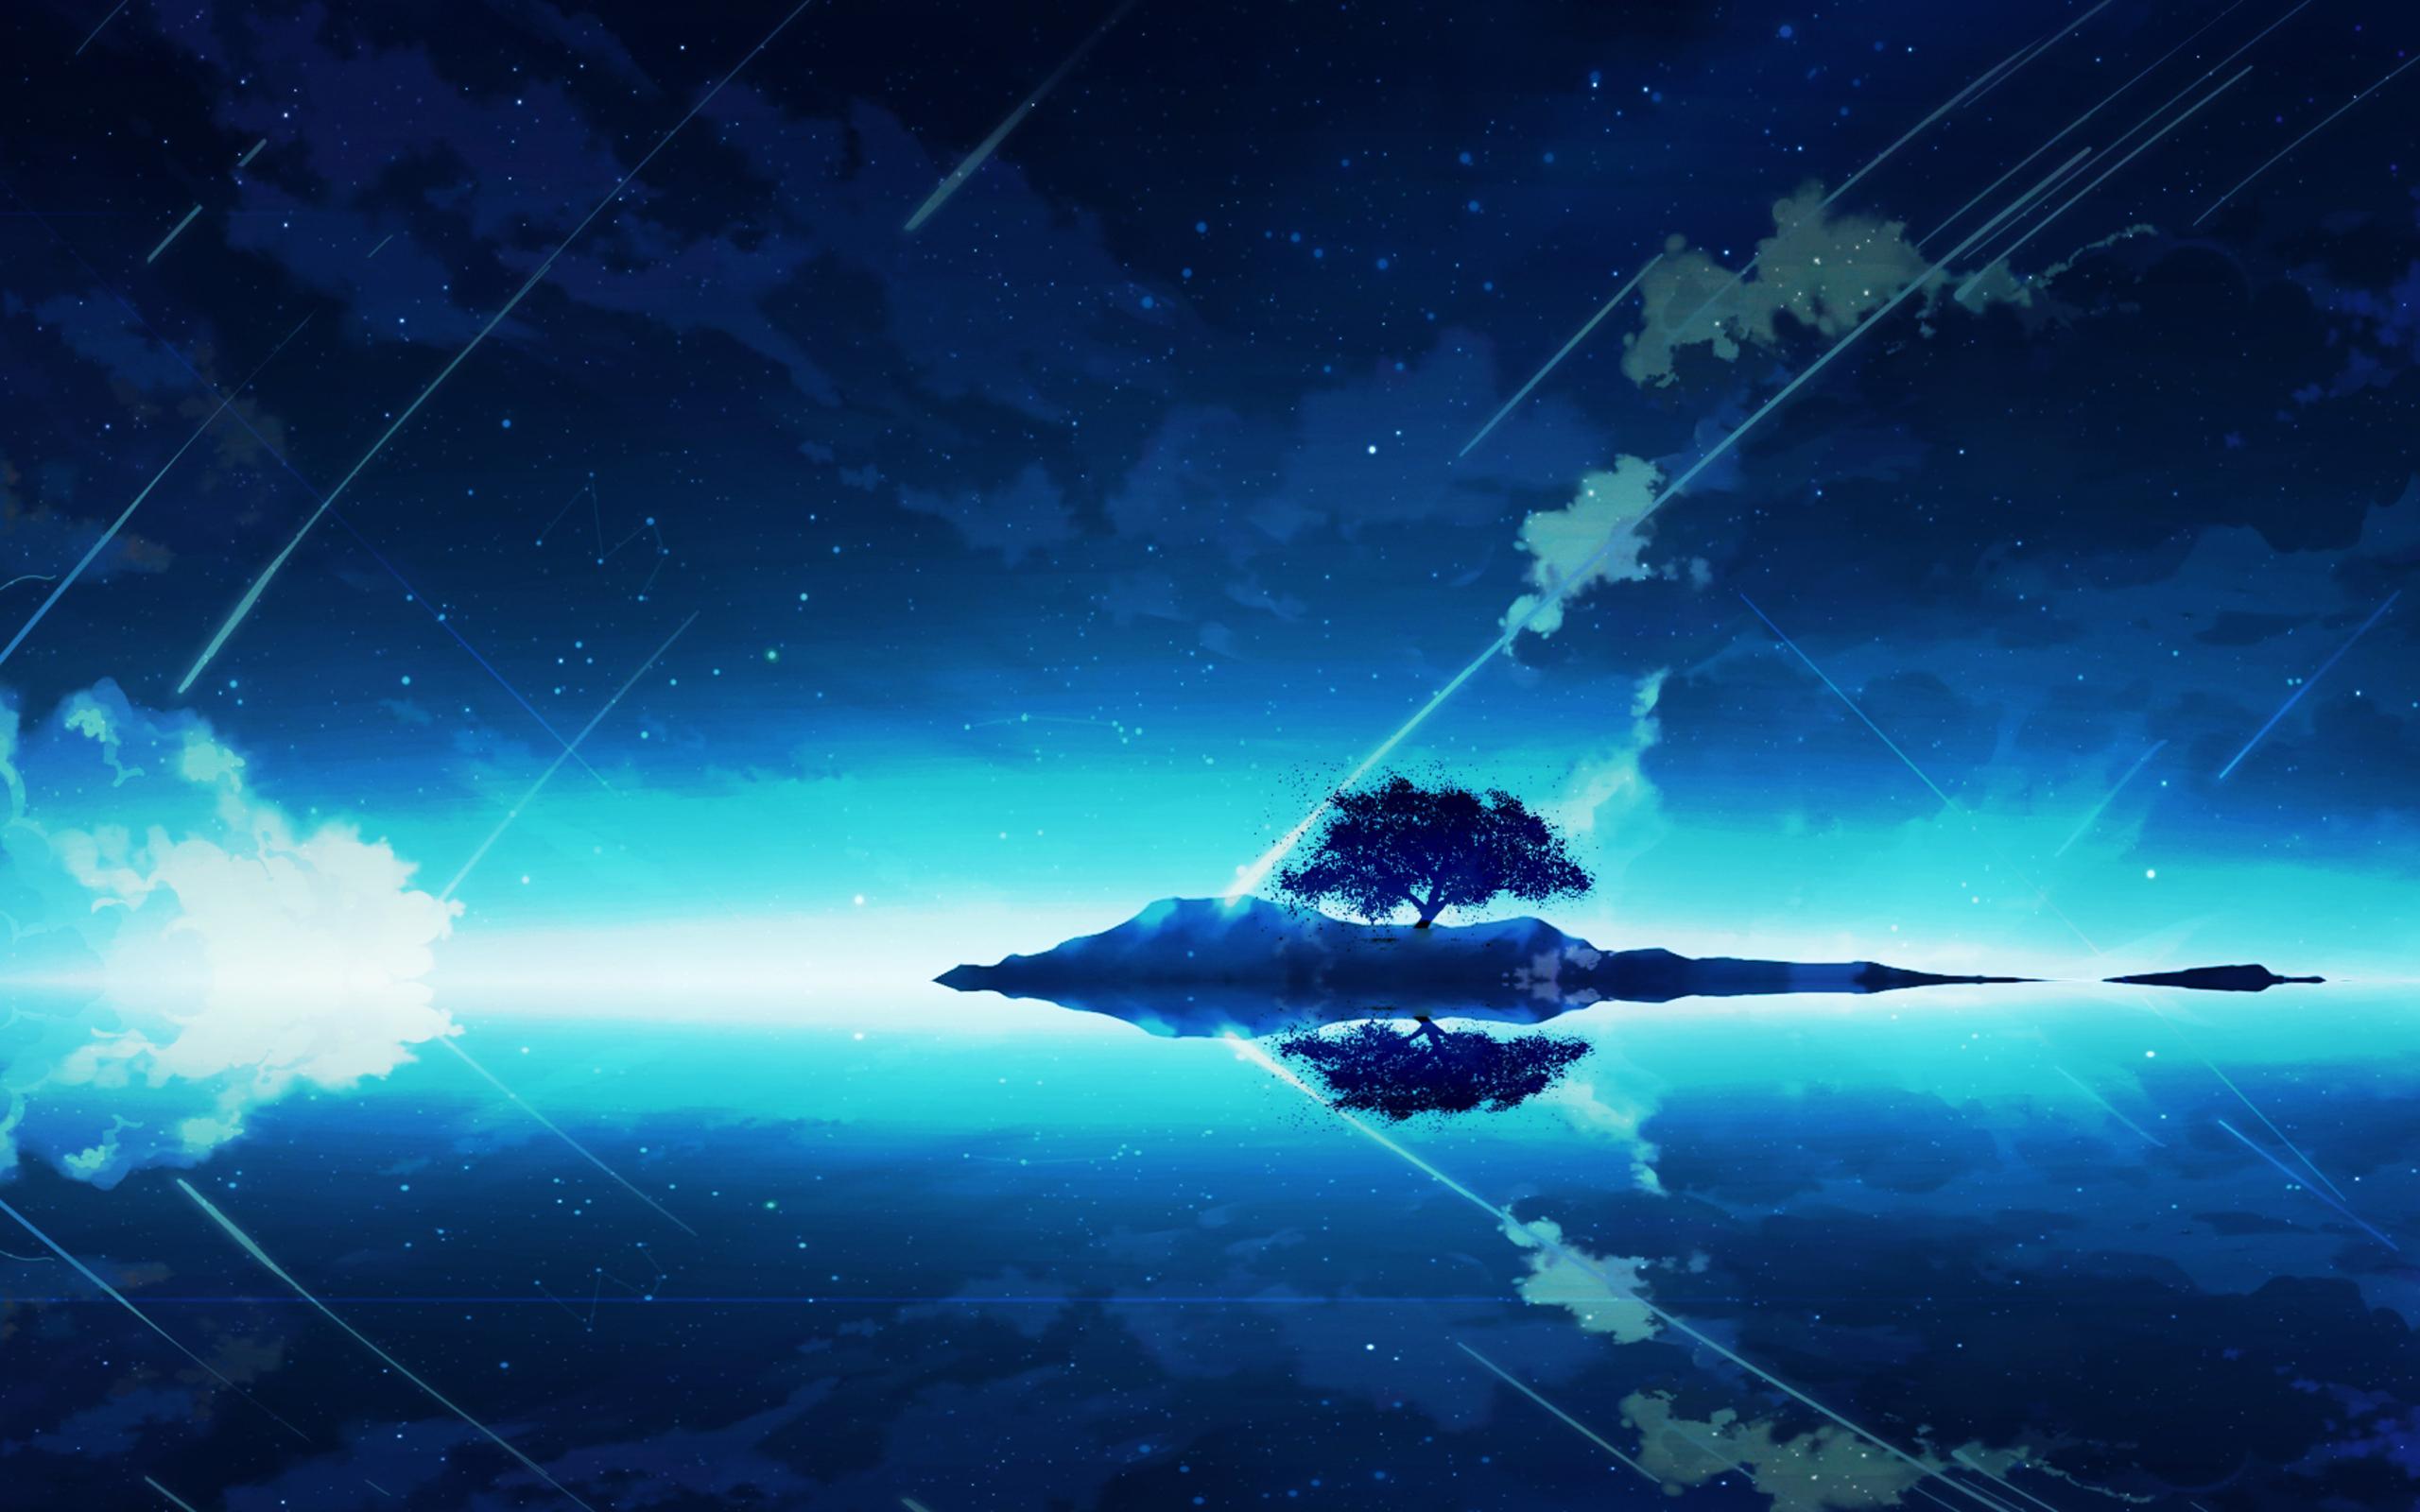 tree-on-mountain-anime-y5.jpg